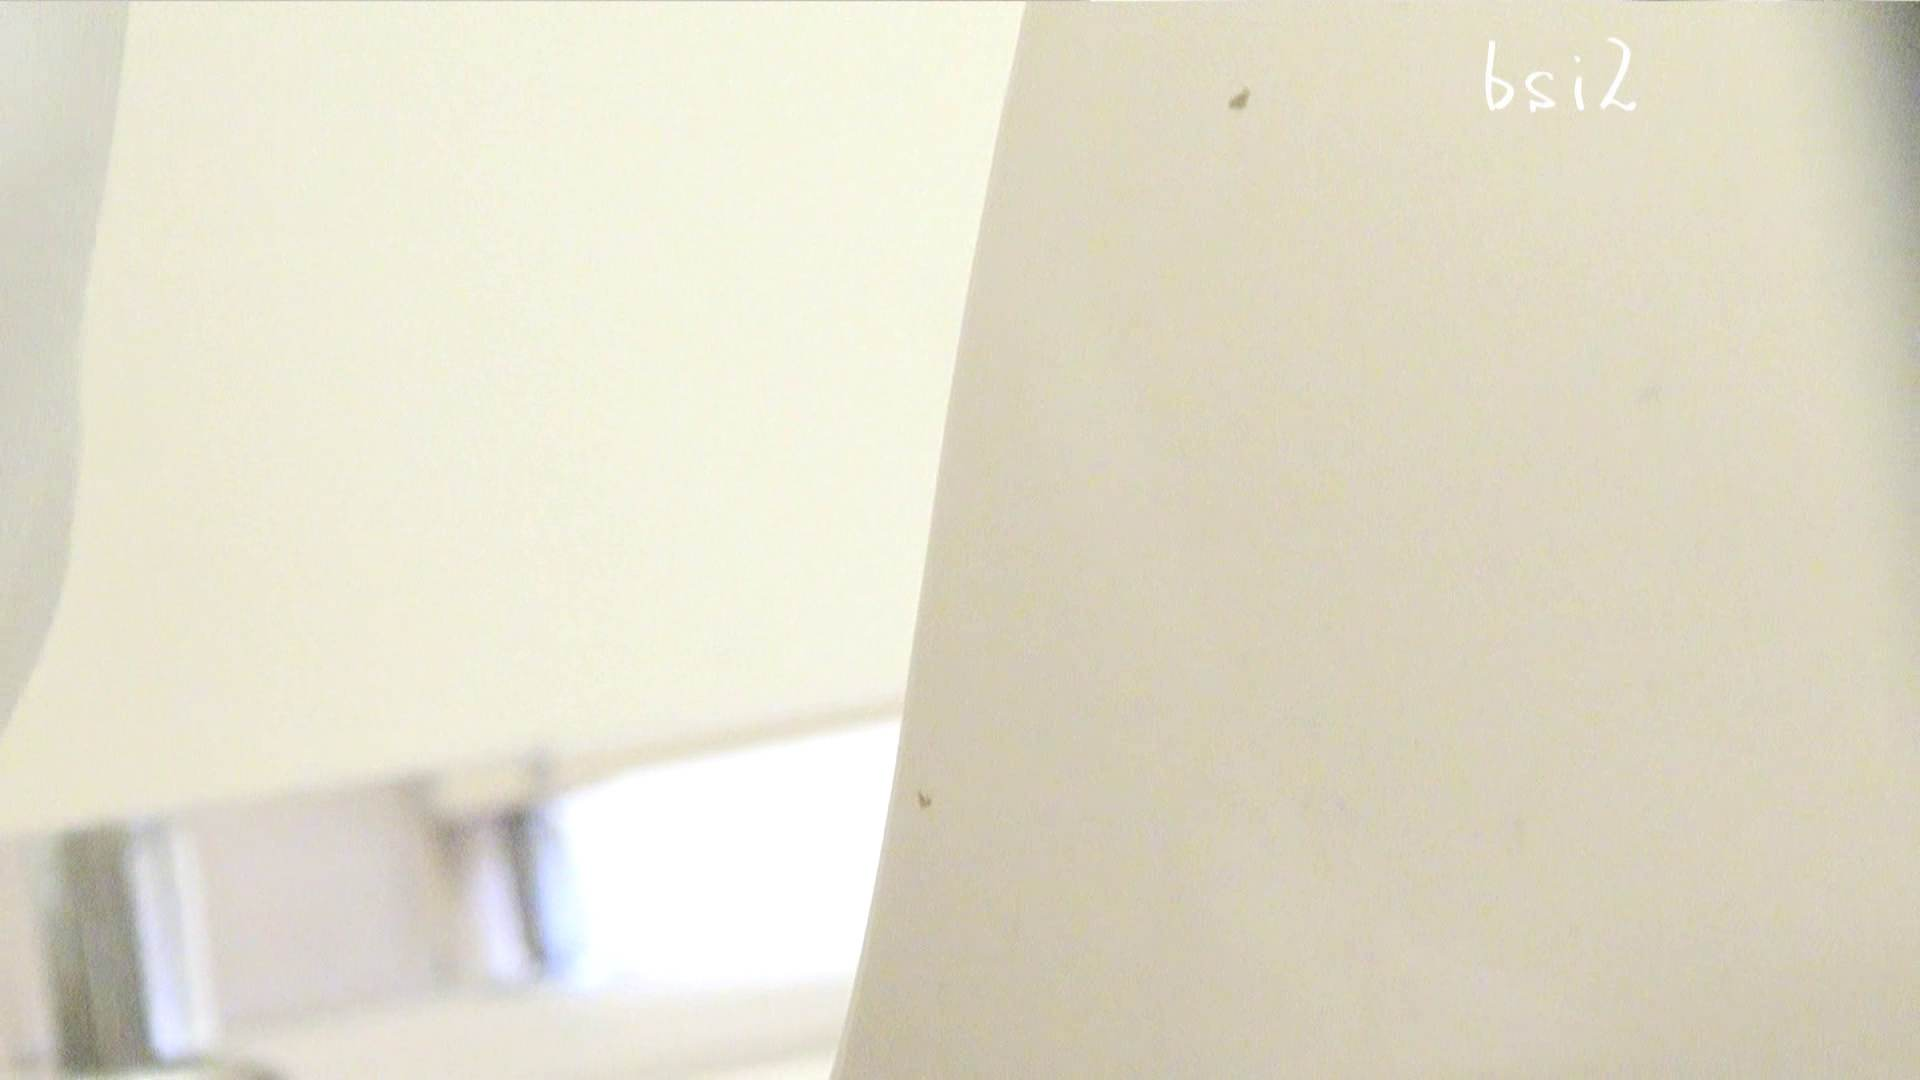 巨乳 乳首:至高下半身盗撮-PREMIUM-【院内病棟編 】VOL2:怪盗ジョーカー